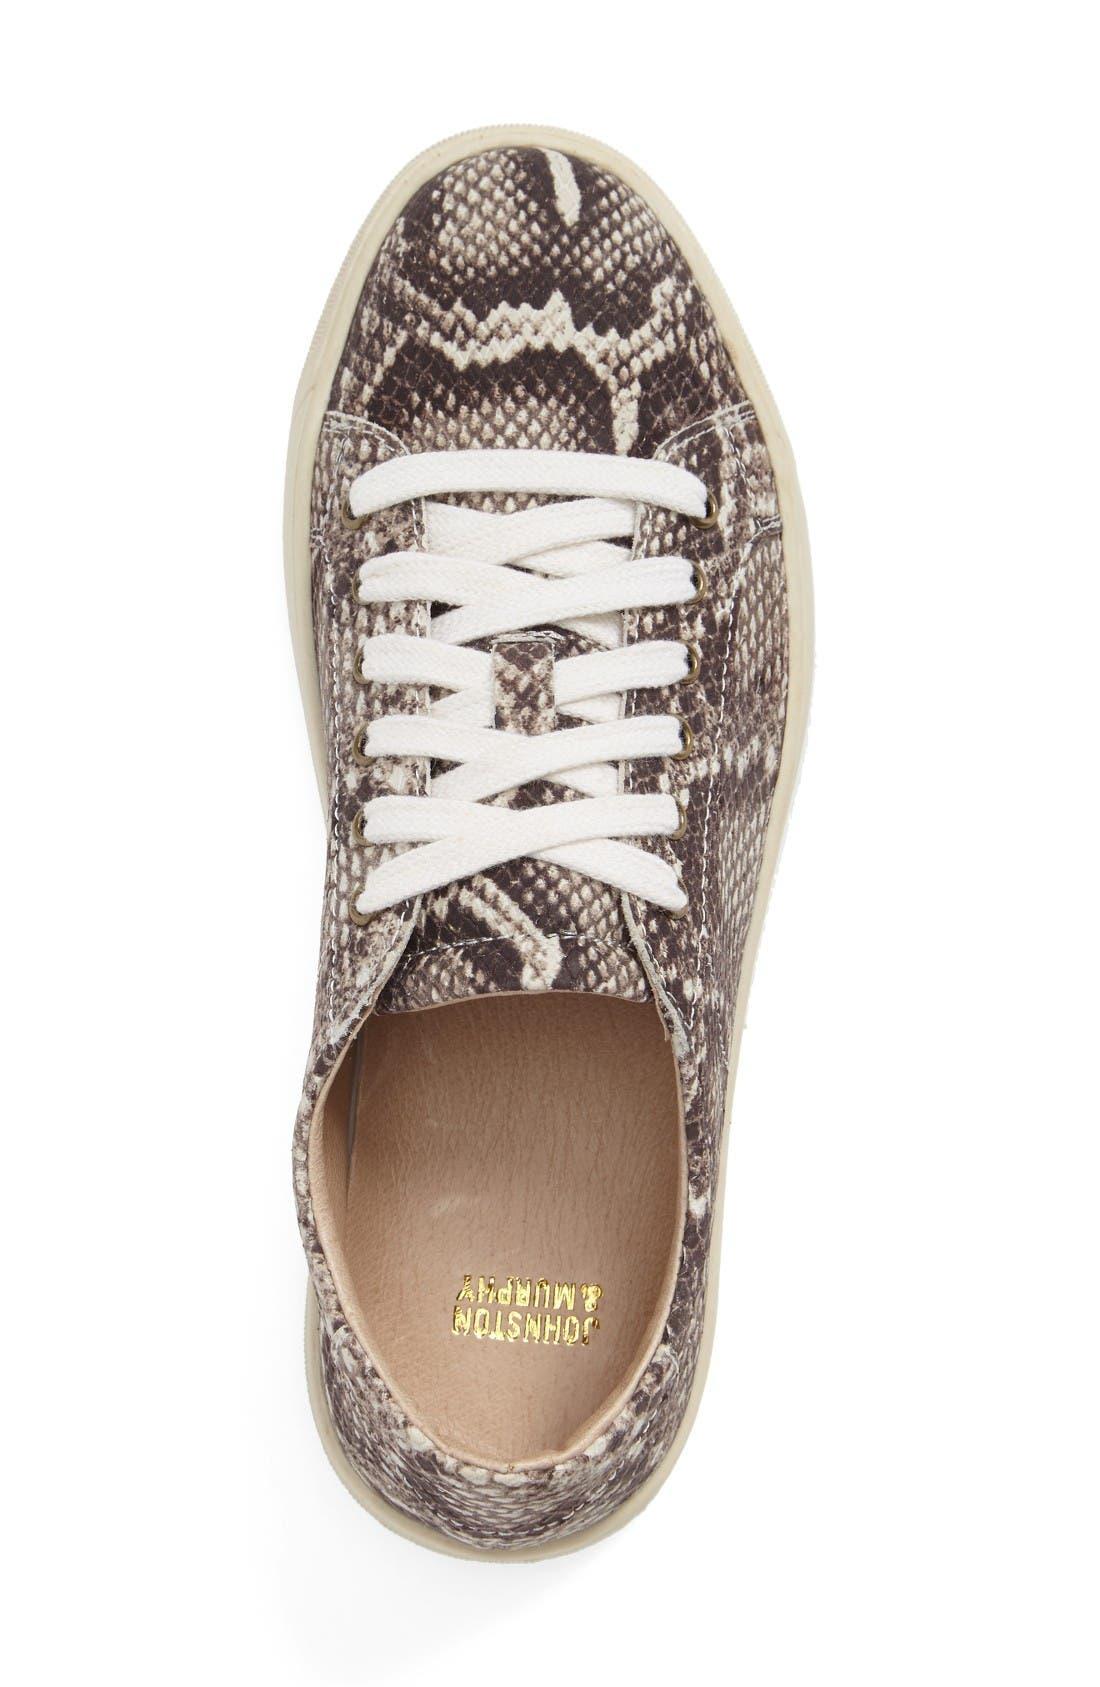 'Emerson' Sneaker,                             Alternate thumbnail 3, color,                             Snake Print Leather